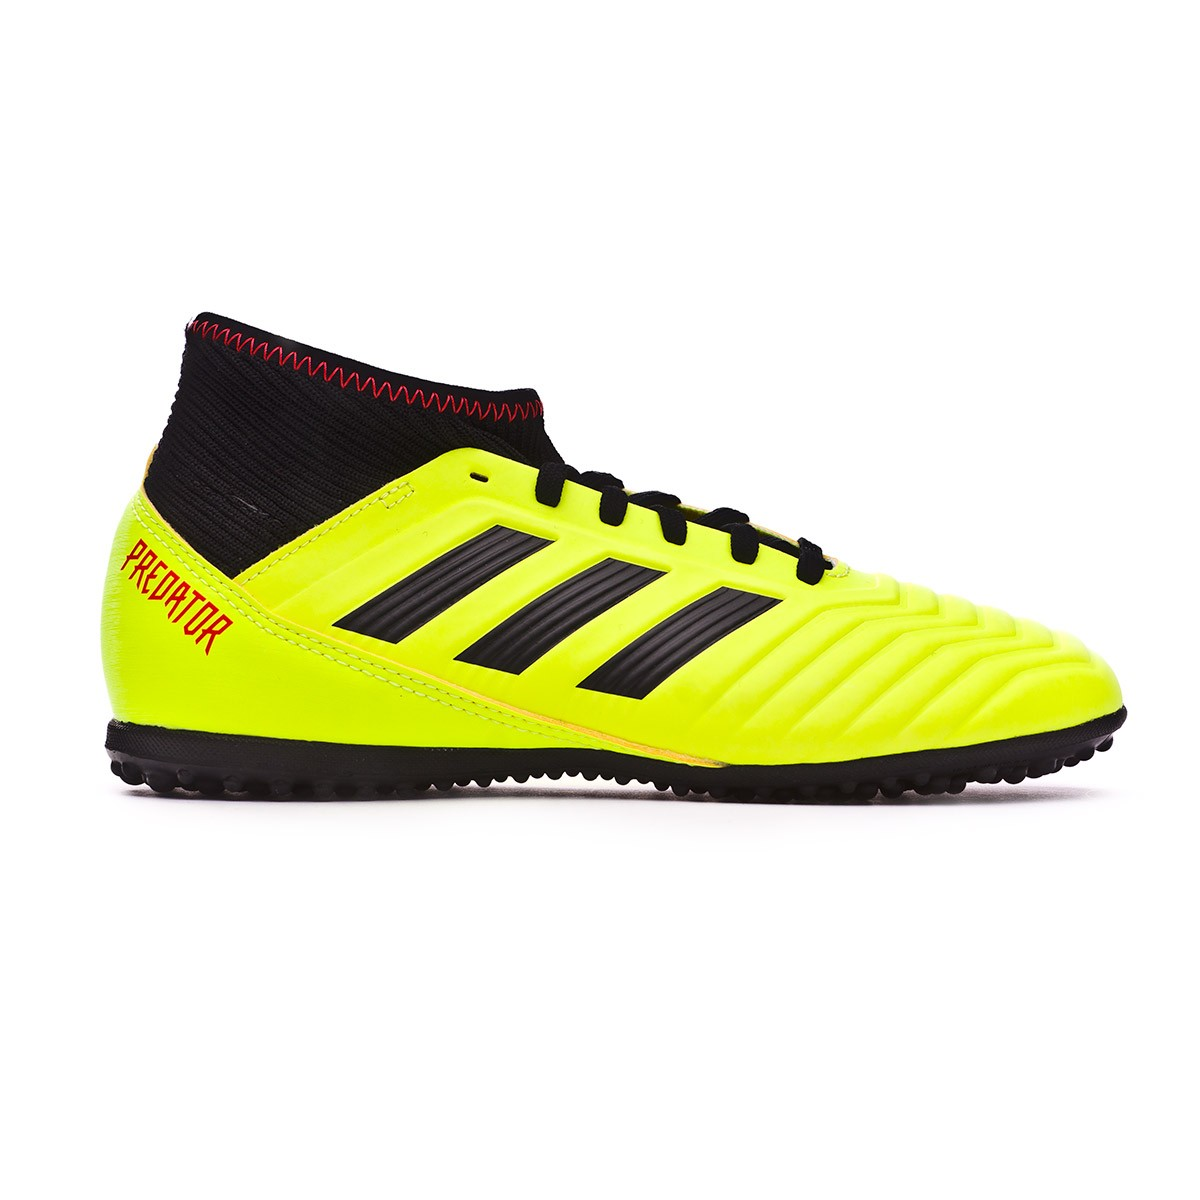 43de5eac0 Football Boot adidas Kids Predator Tango 18.3 Turf Solar yellow-Black-Solar  red - Football store Fútbol Emotion